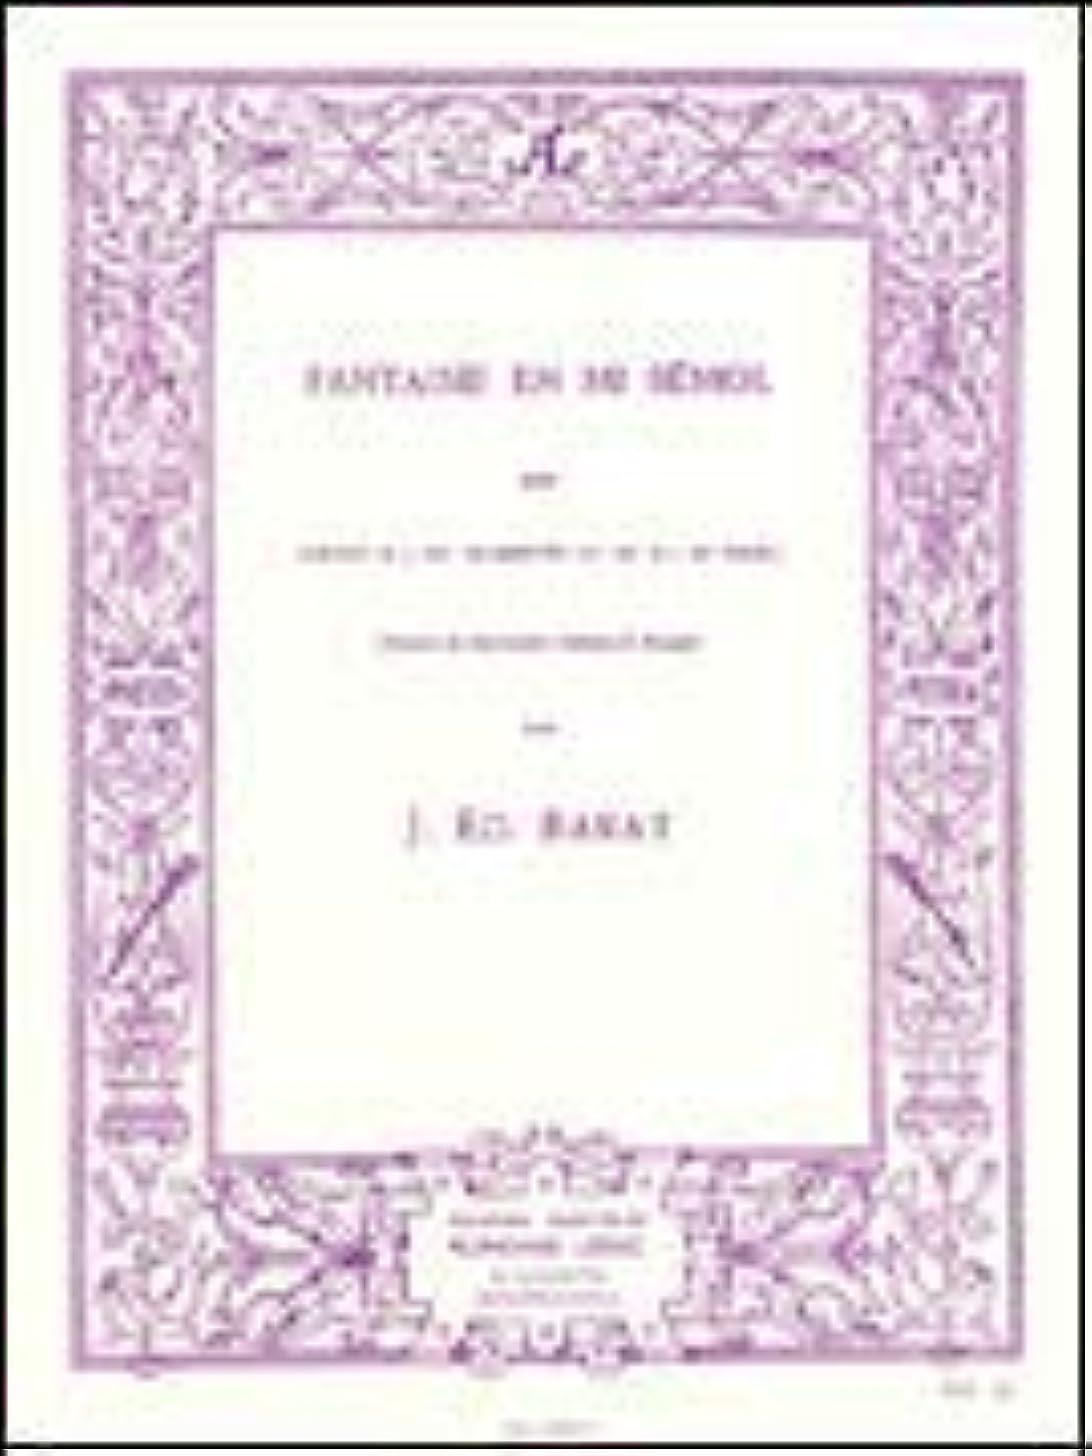 Fantaisie En Mi Bémol: for Cornet or Trumpet and Piano